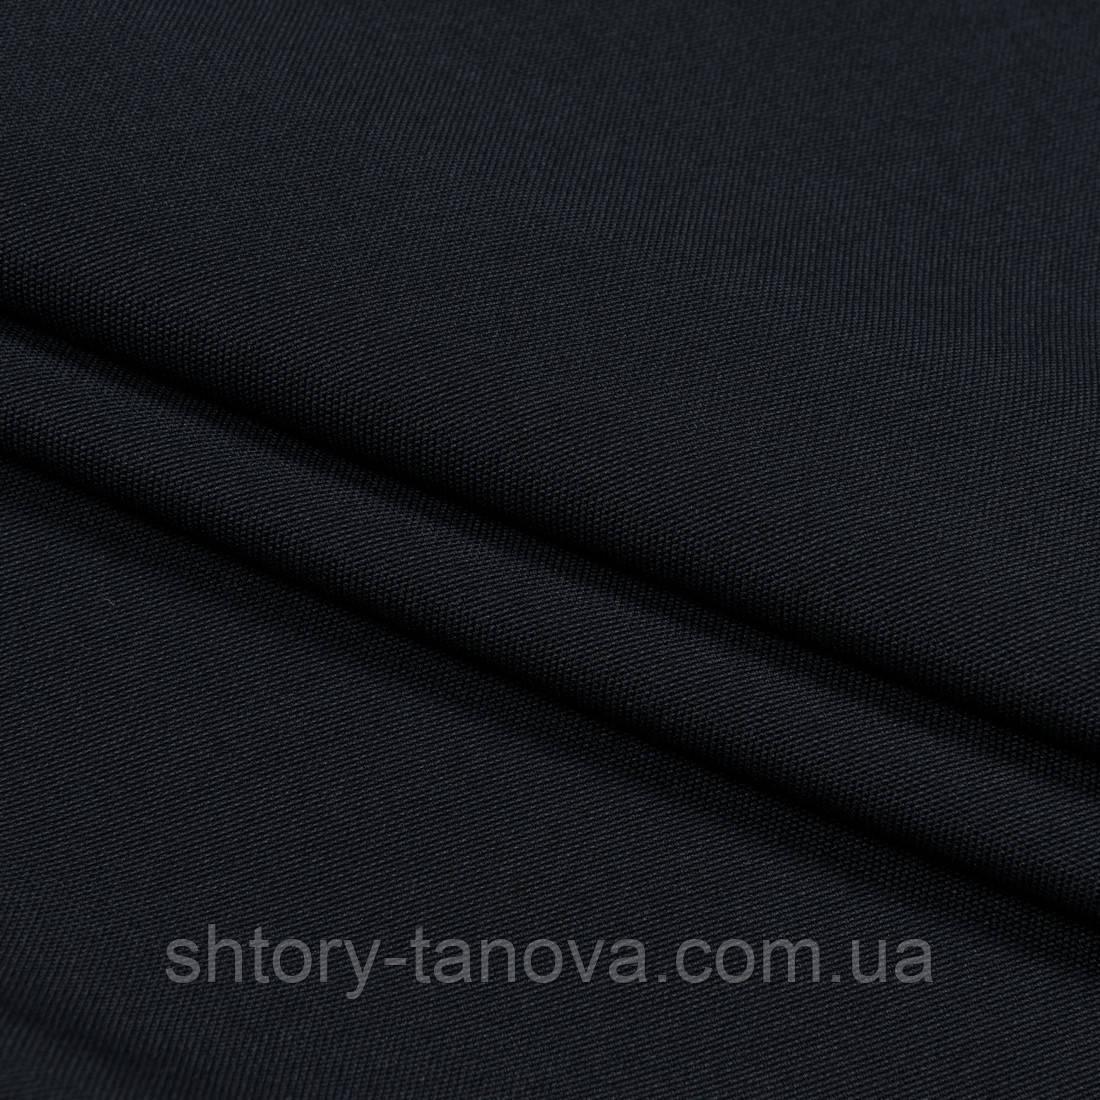 Декоративная ткань плотная рогожка  чорний